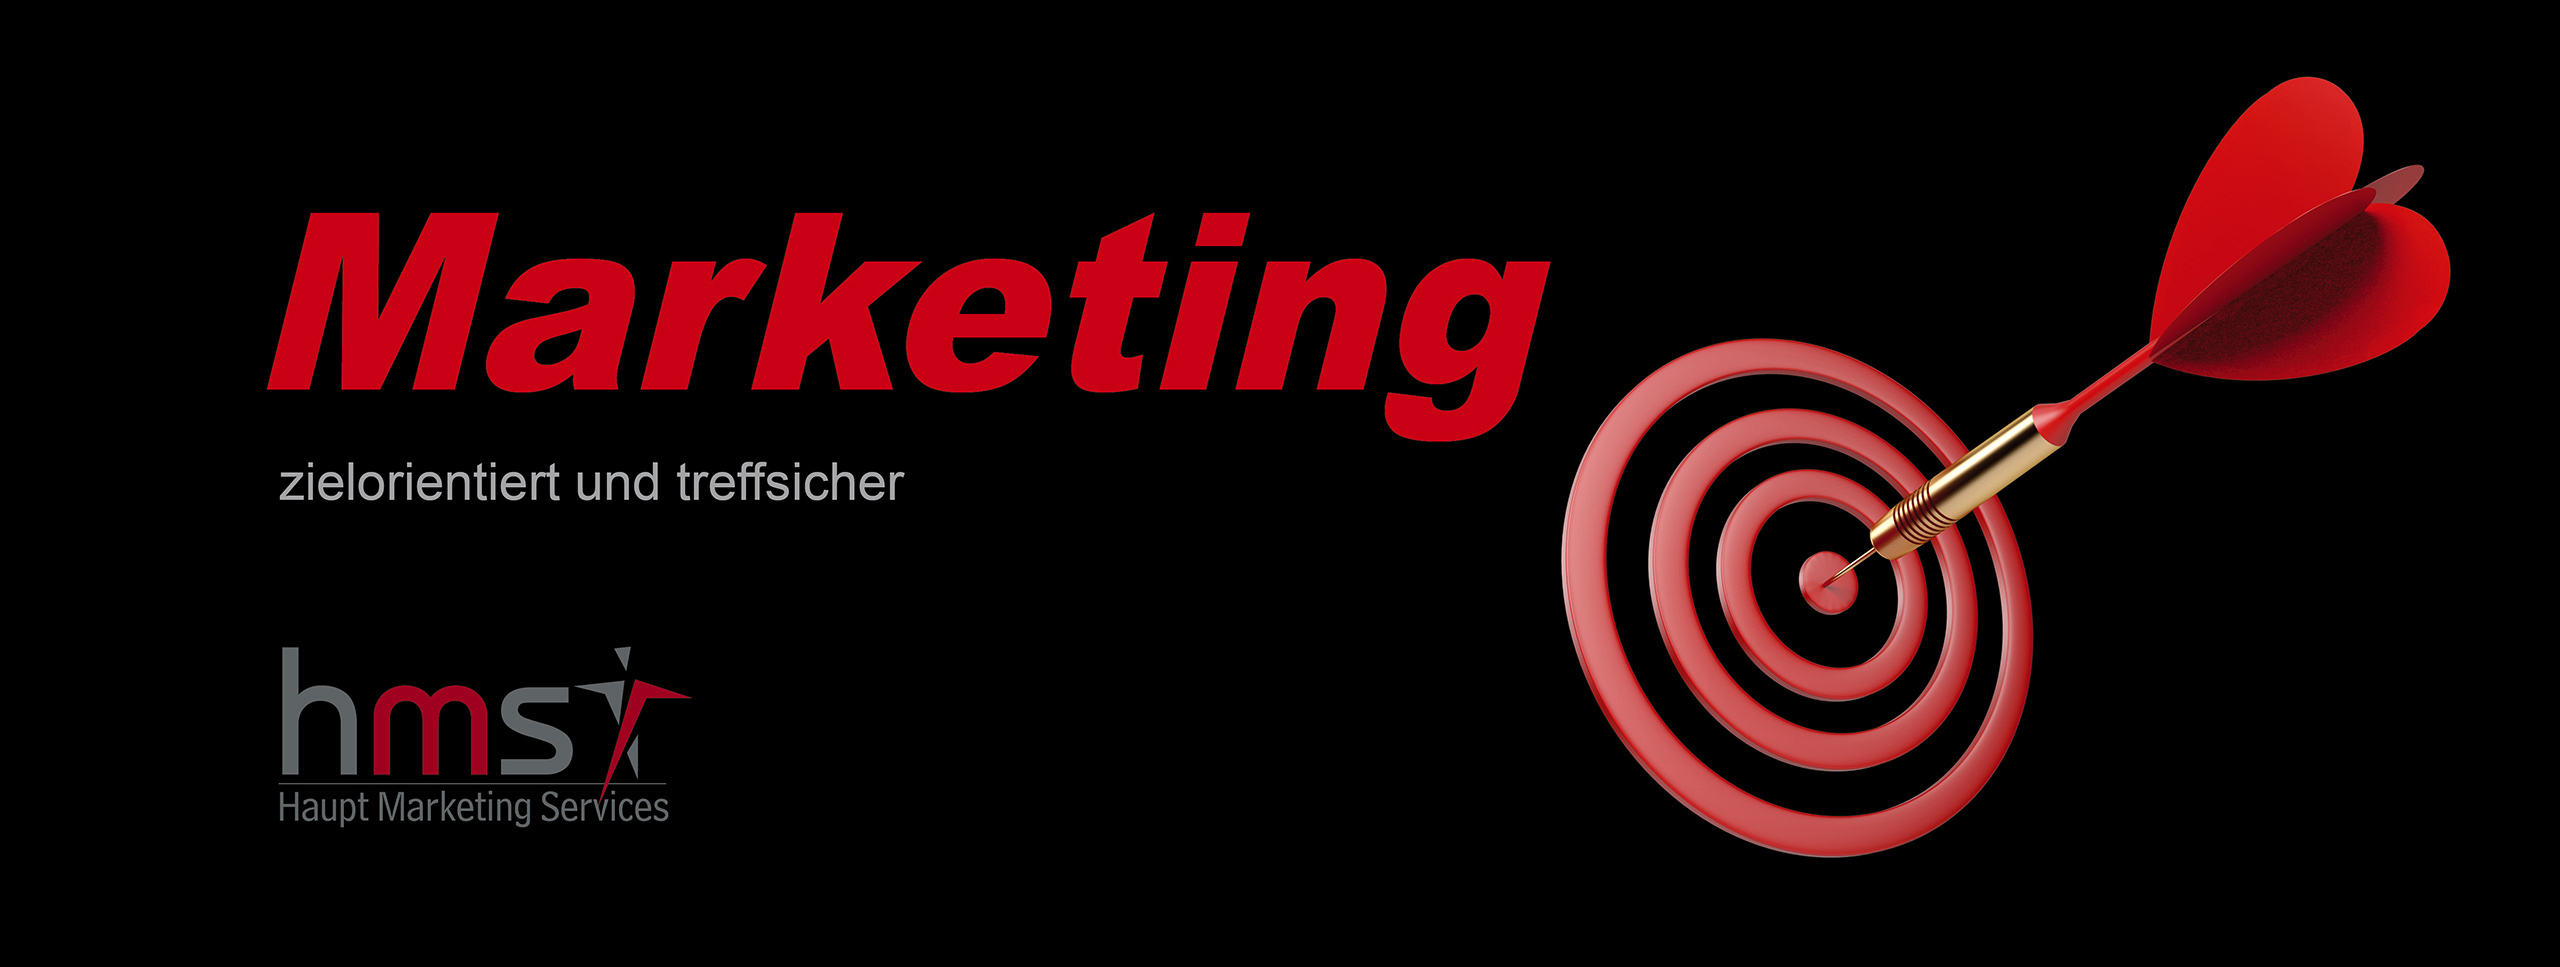 012_Web01_2017_Marketing